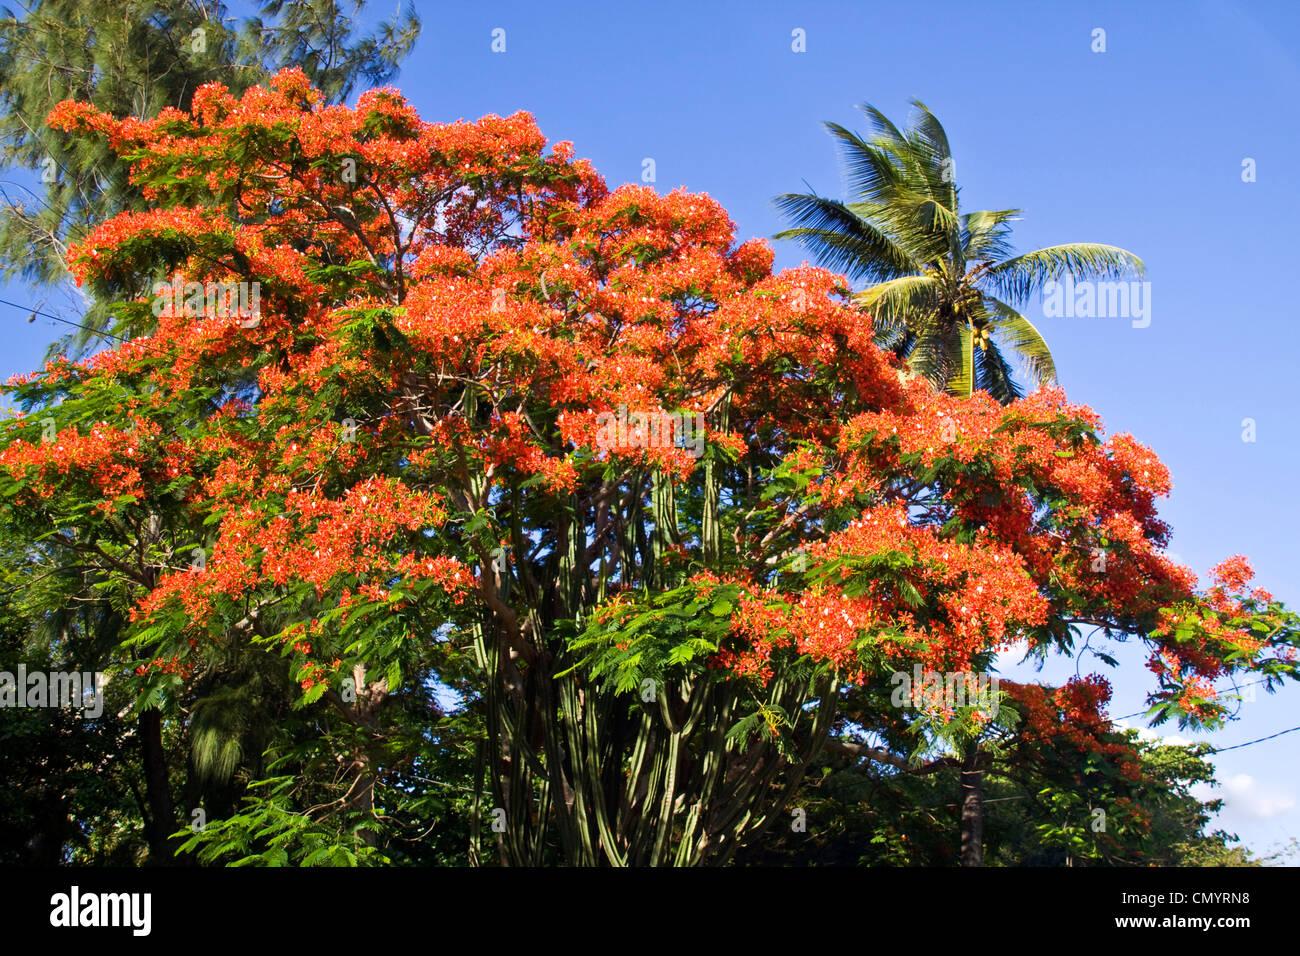 Flame Tree, Flamboyant, Royal Poinciana, nobody, Mauritius, Africa - Stock Image